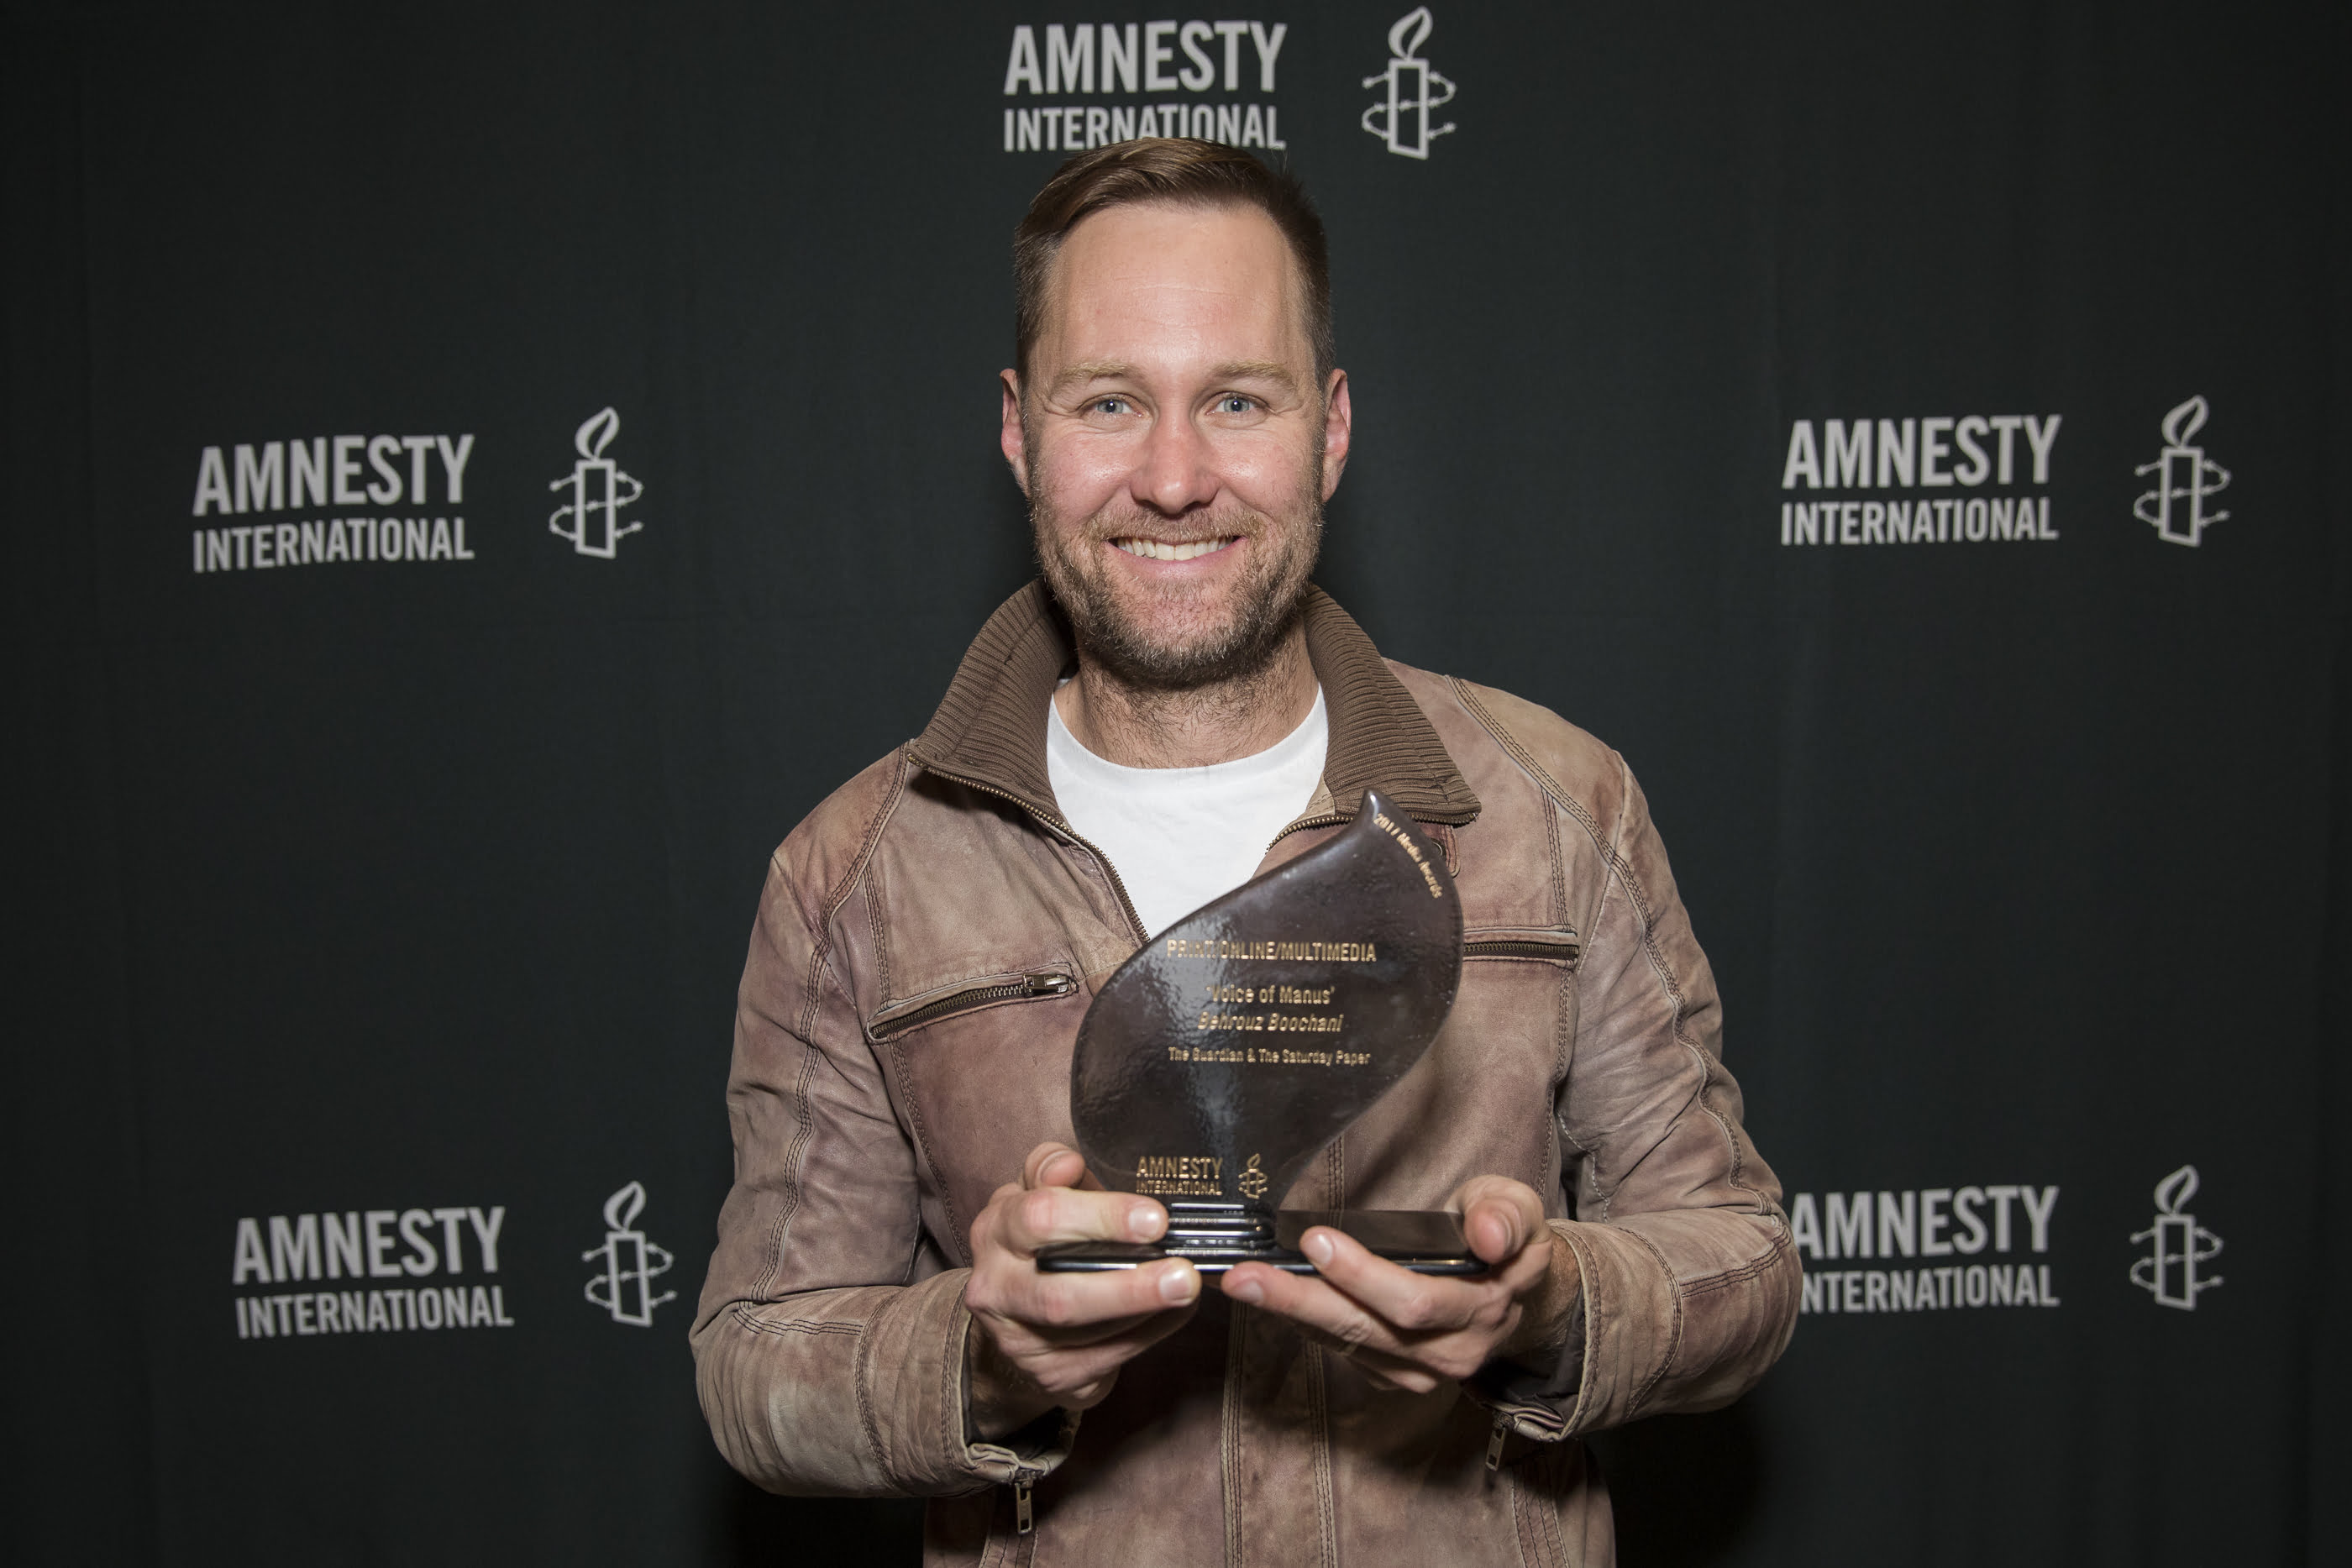 Pete Doherty collects a 2017 Amnesty International Media Award on behalf of Behrouz Boochani. © Joseph Mayers Photography